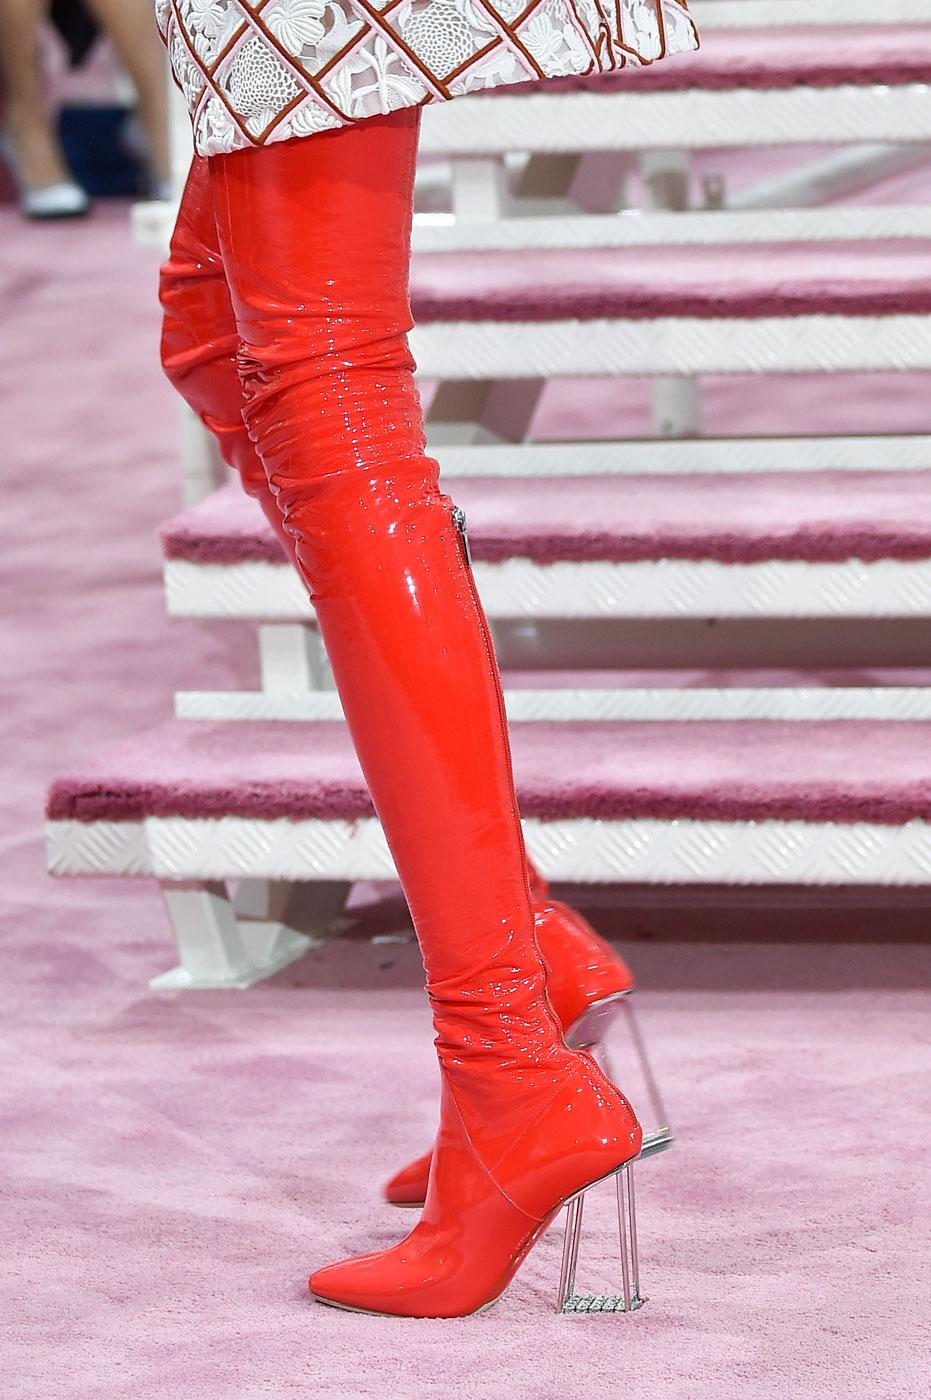 Christian-Dior-fashion-runway-show-close-ups-haute-couture-paris-spring-summer-2015-the-impression-086